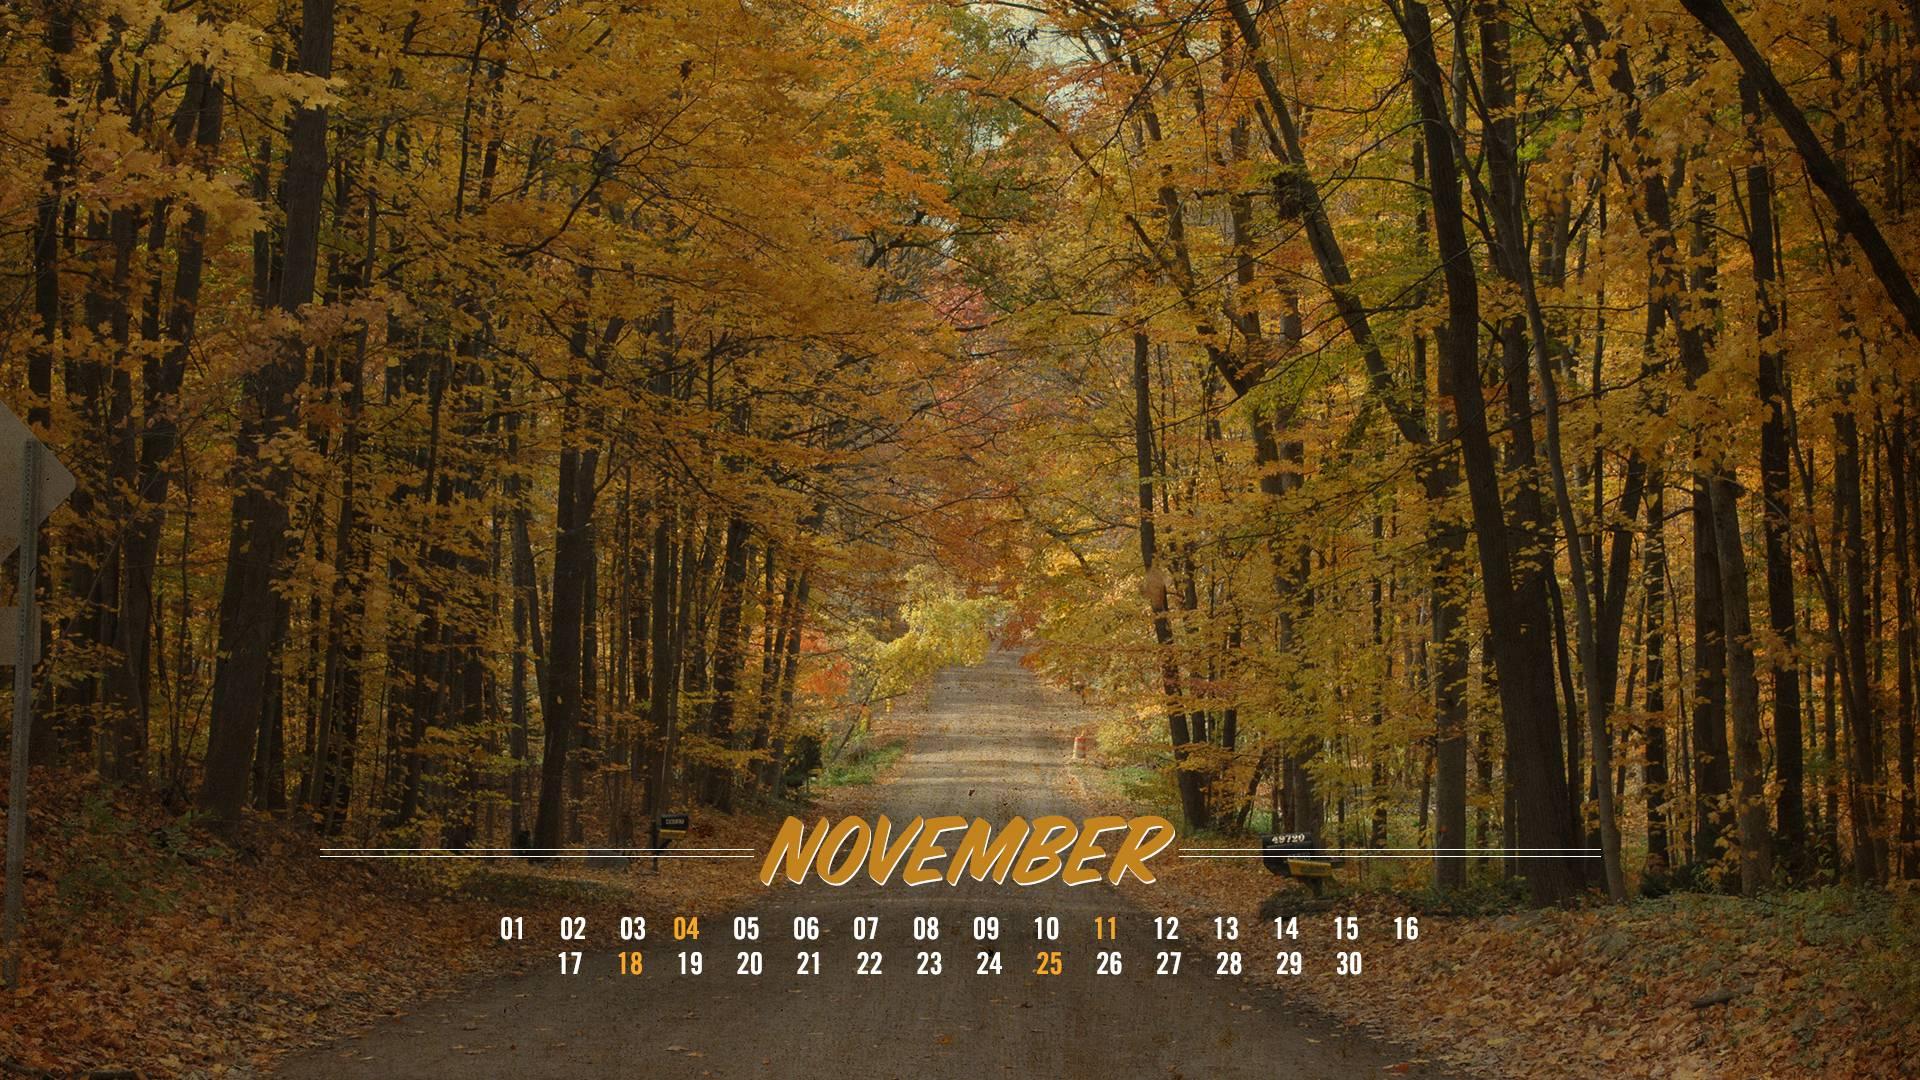 november wallpapers